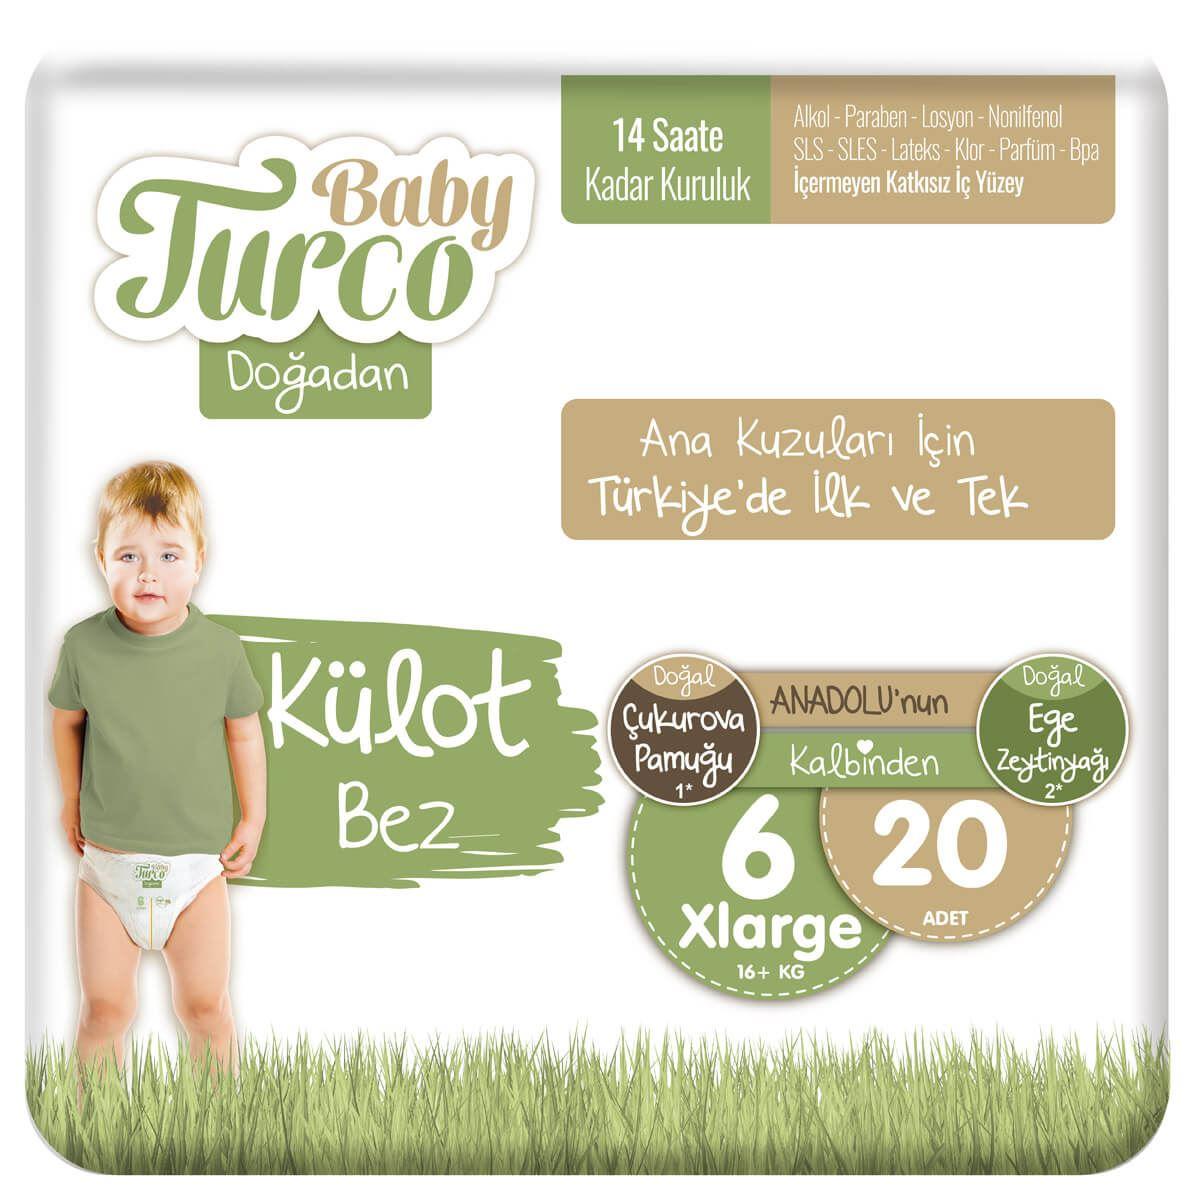 Baby Turco Doğadan Külot Bez 6 Numara Xlarge 20 Adet